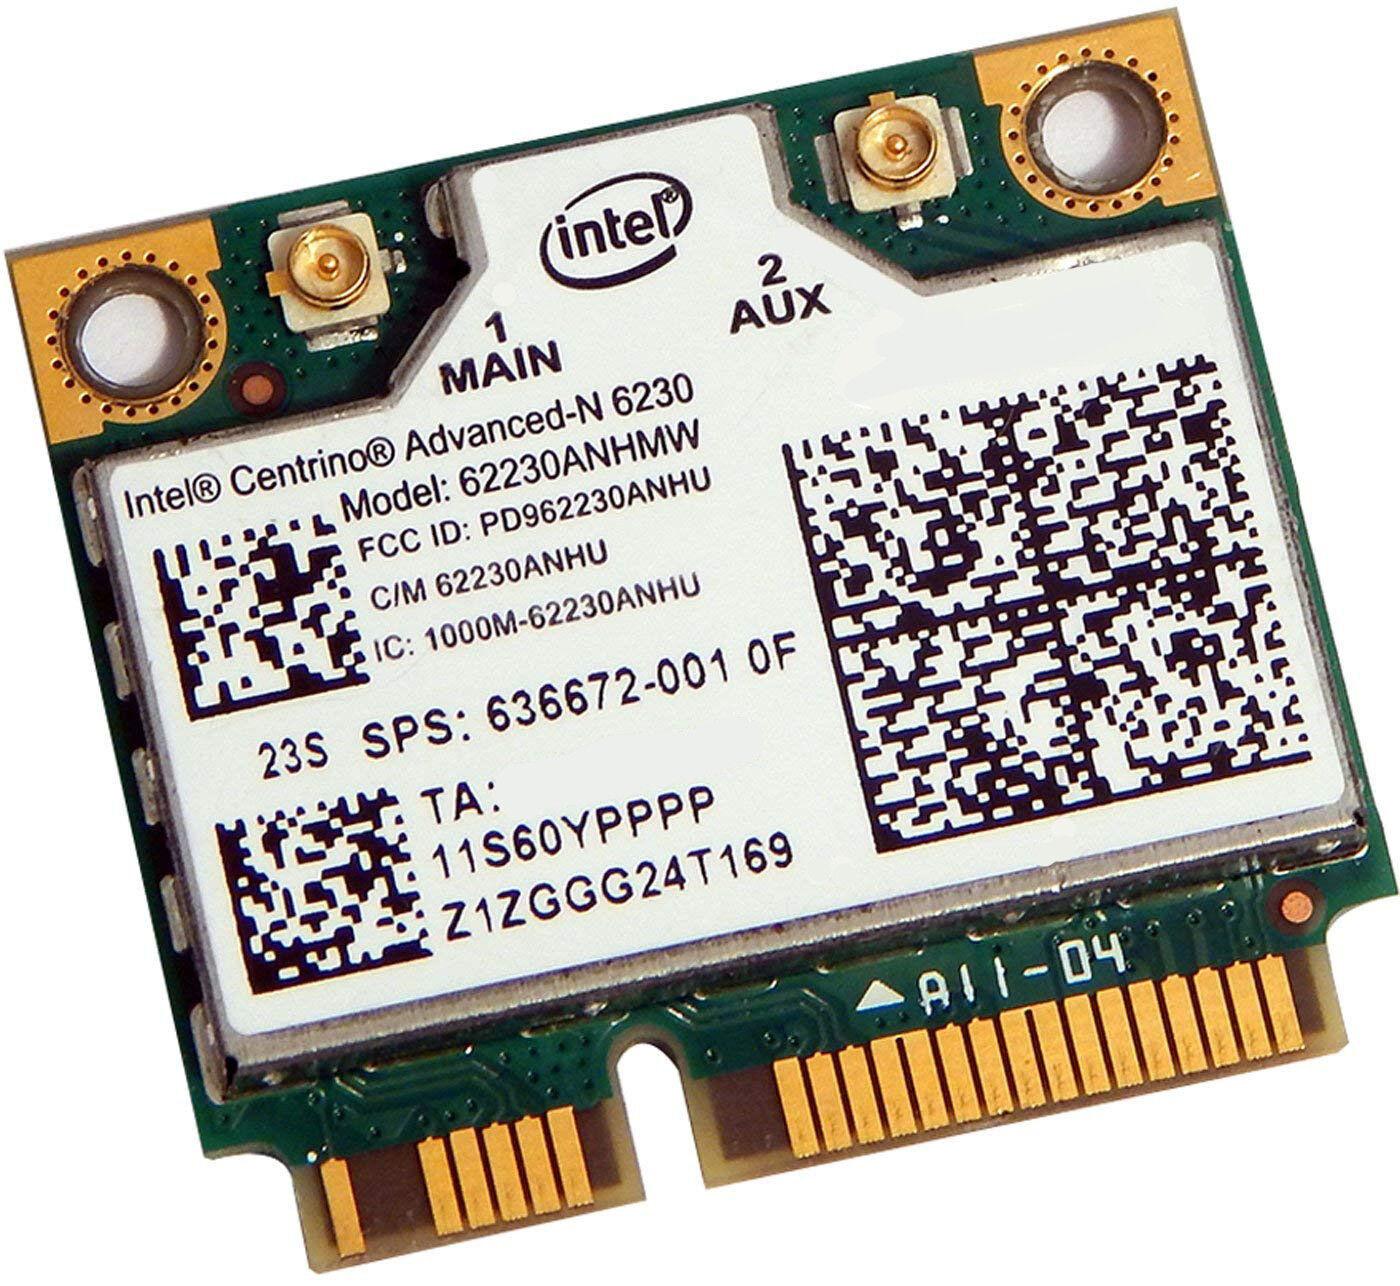 HP 3115m Pavillion DM1 -4000 Advanced N Dual Band Bluetooth Wireless WIFI Card